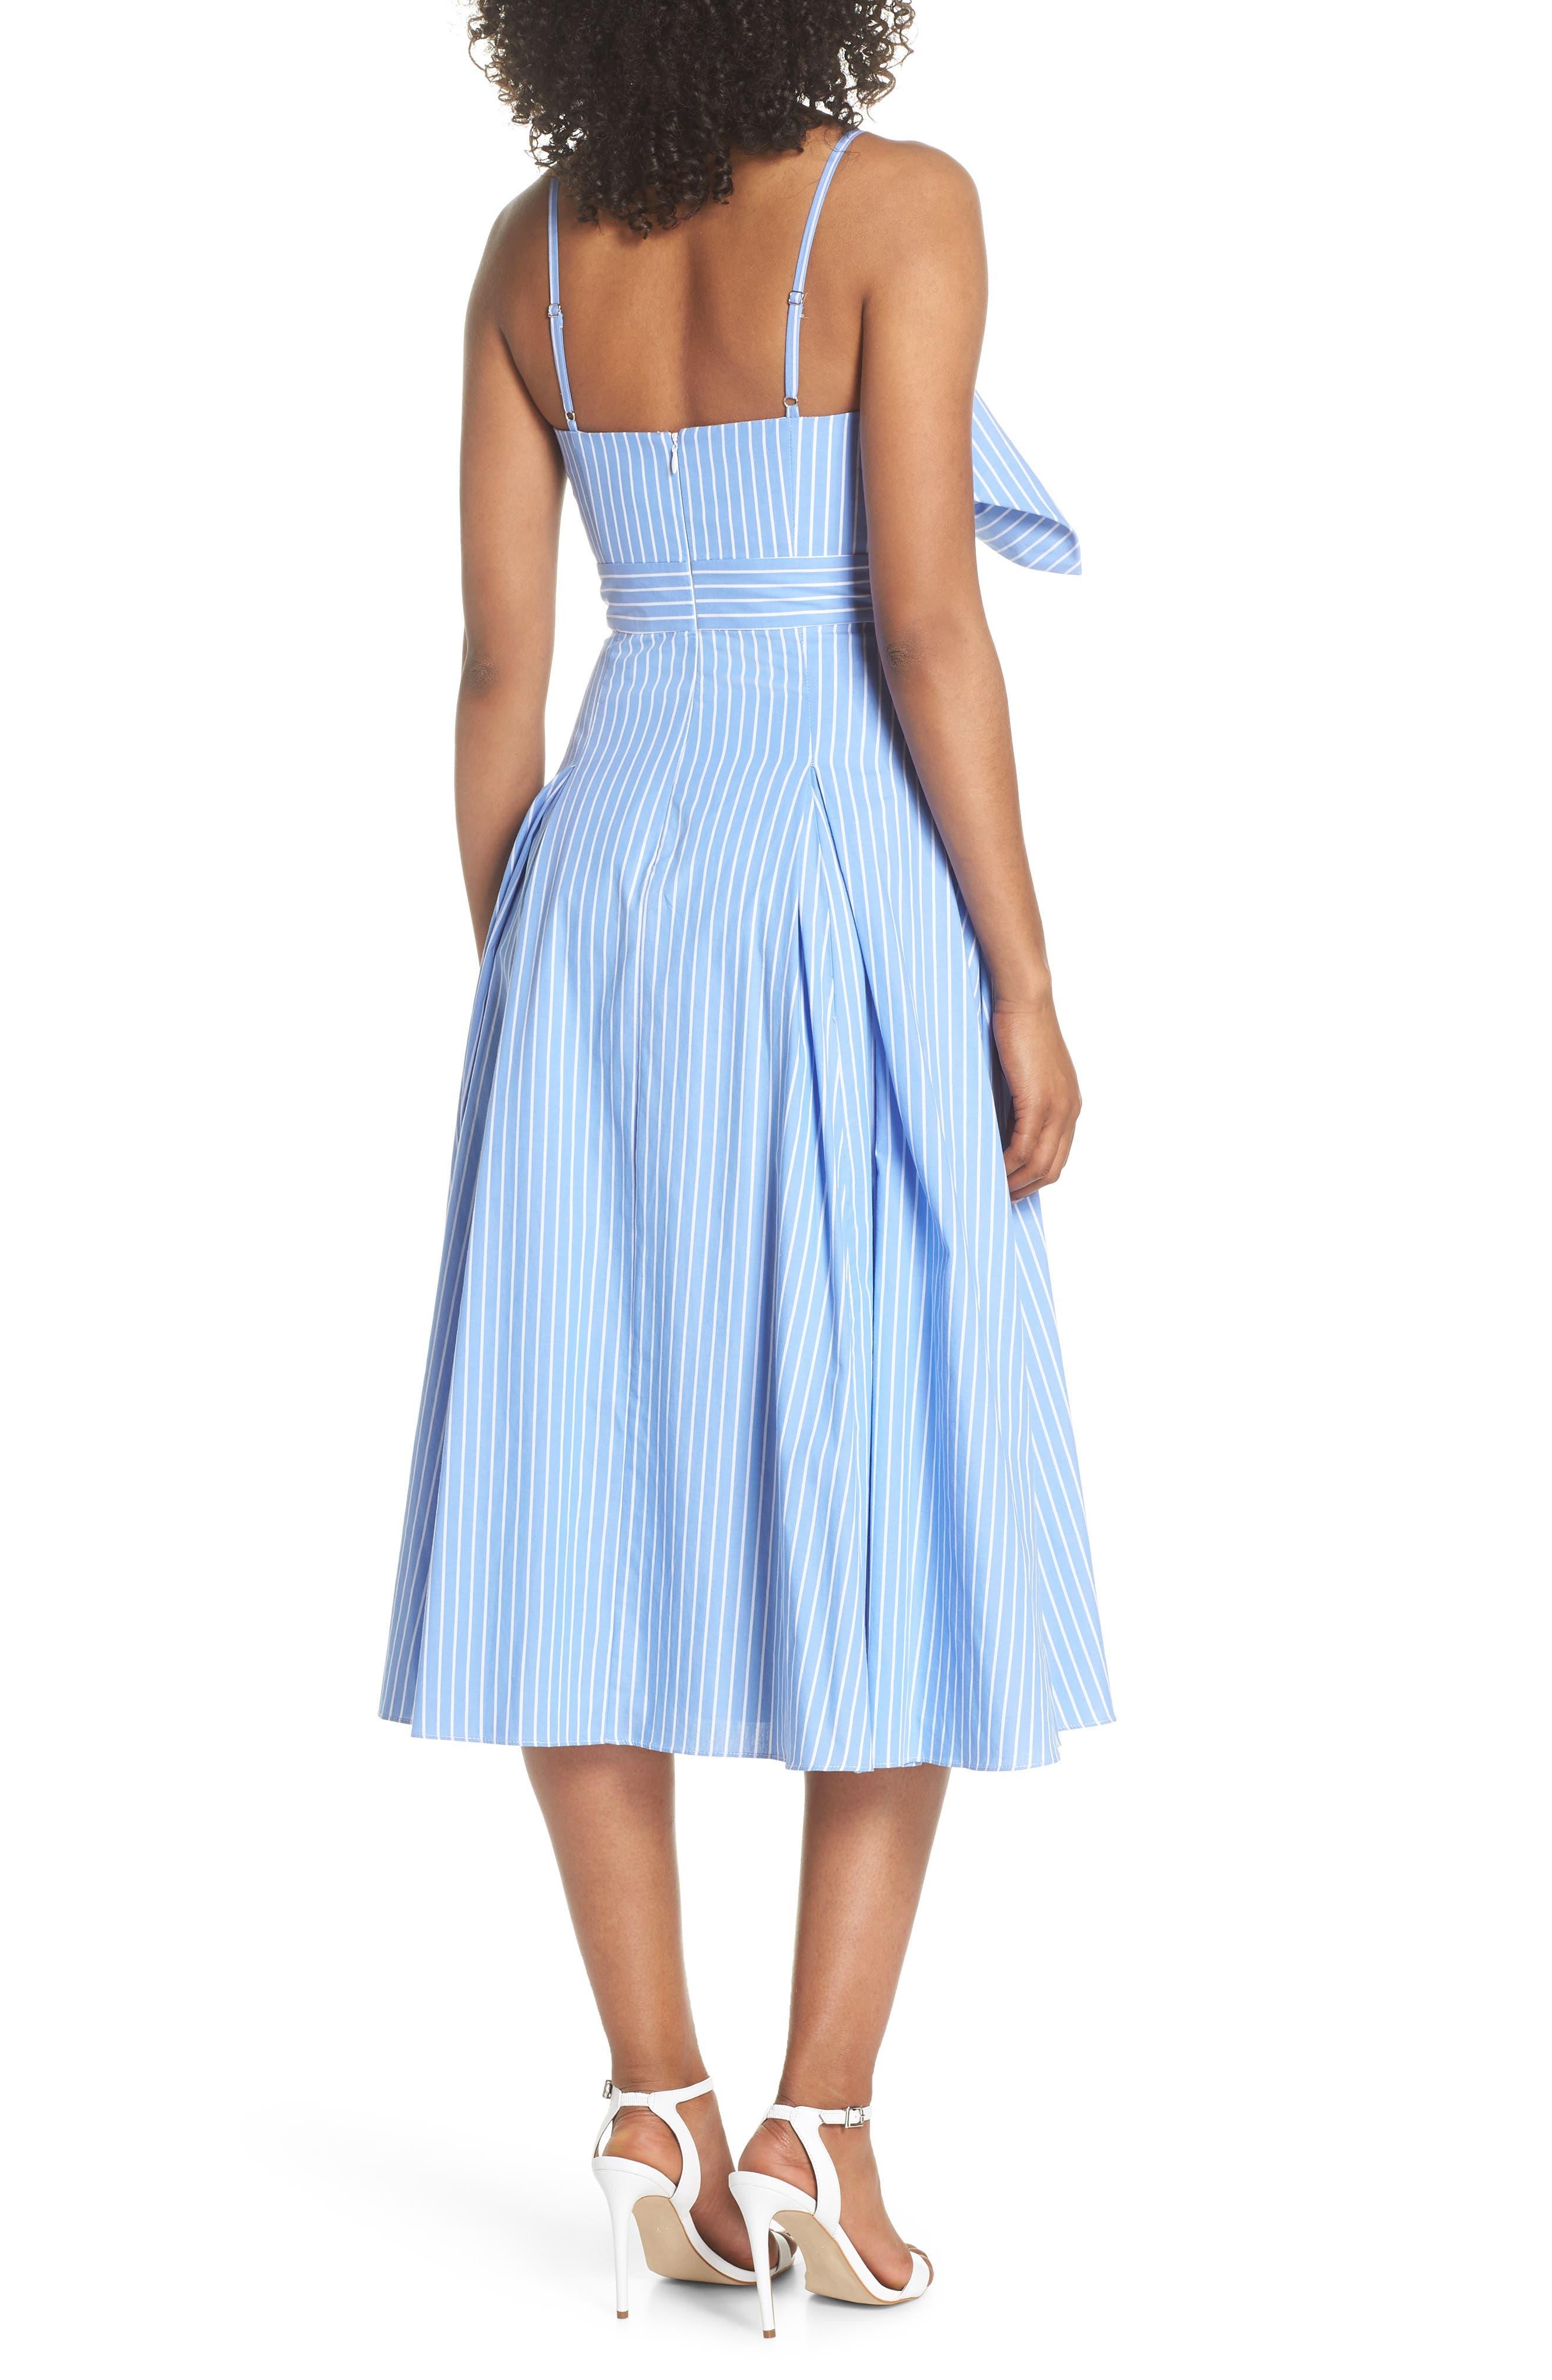 Becky Bow Front Tea Length Dress,                             Alternate thumbnail 2, color,                             450